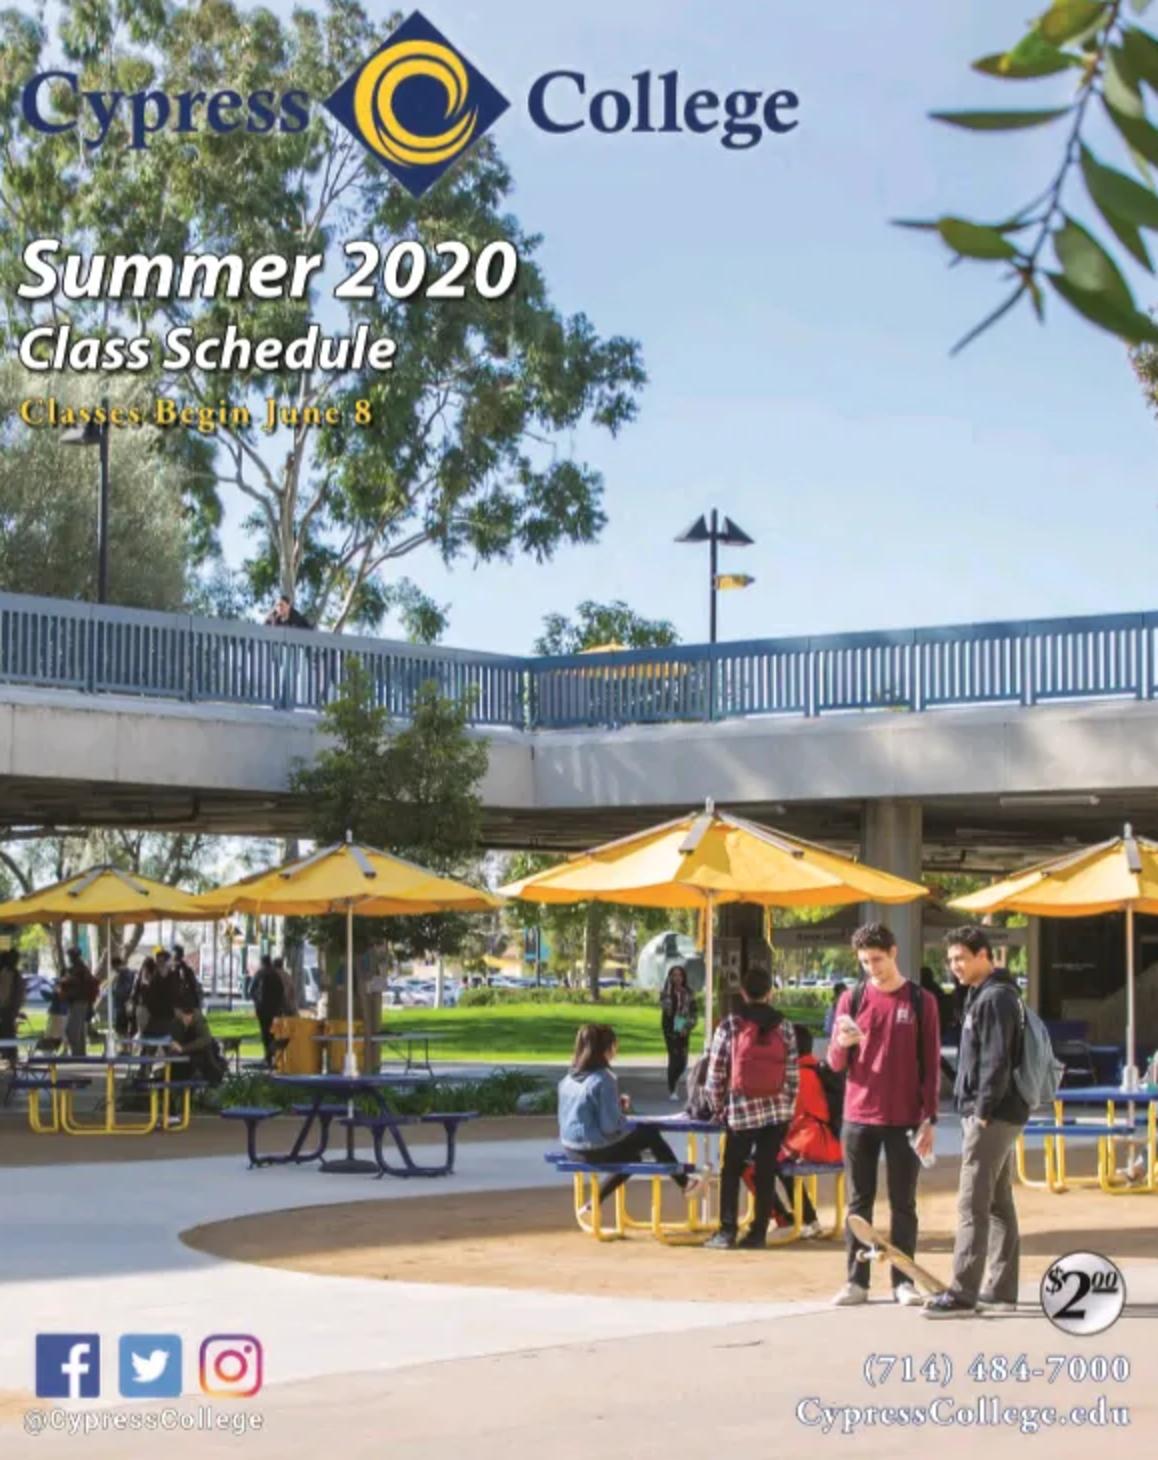 Cypress College Summer 2020 Class Schedule Cover